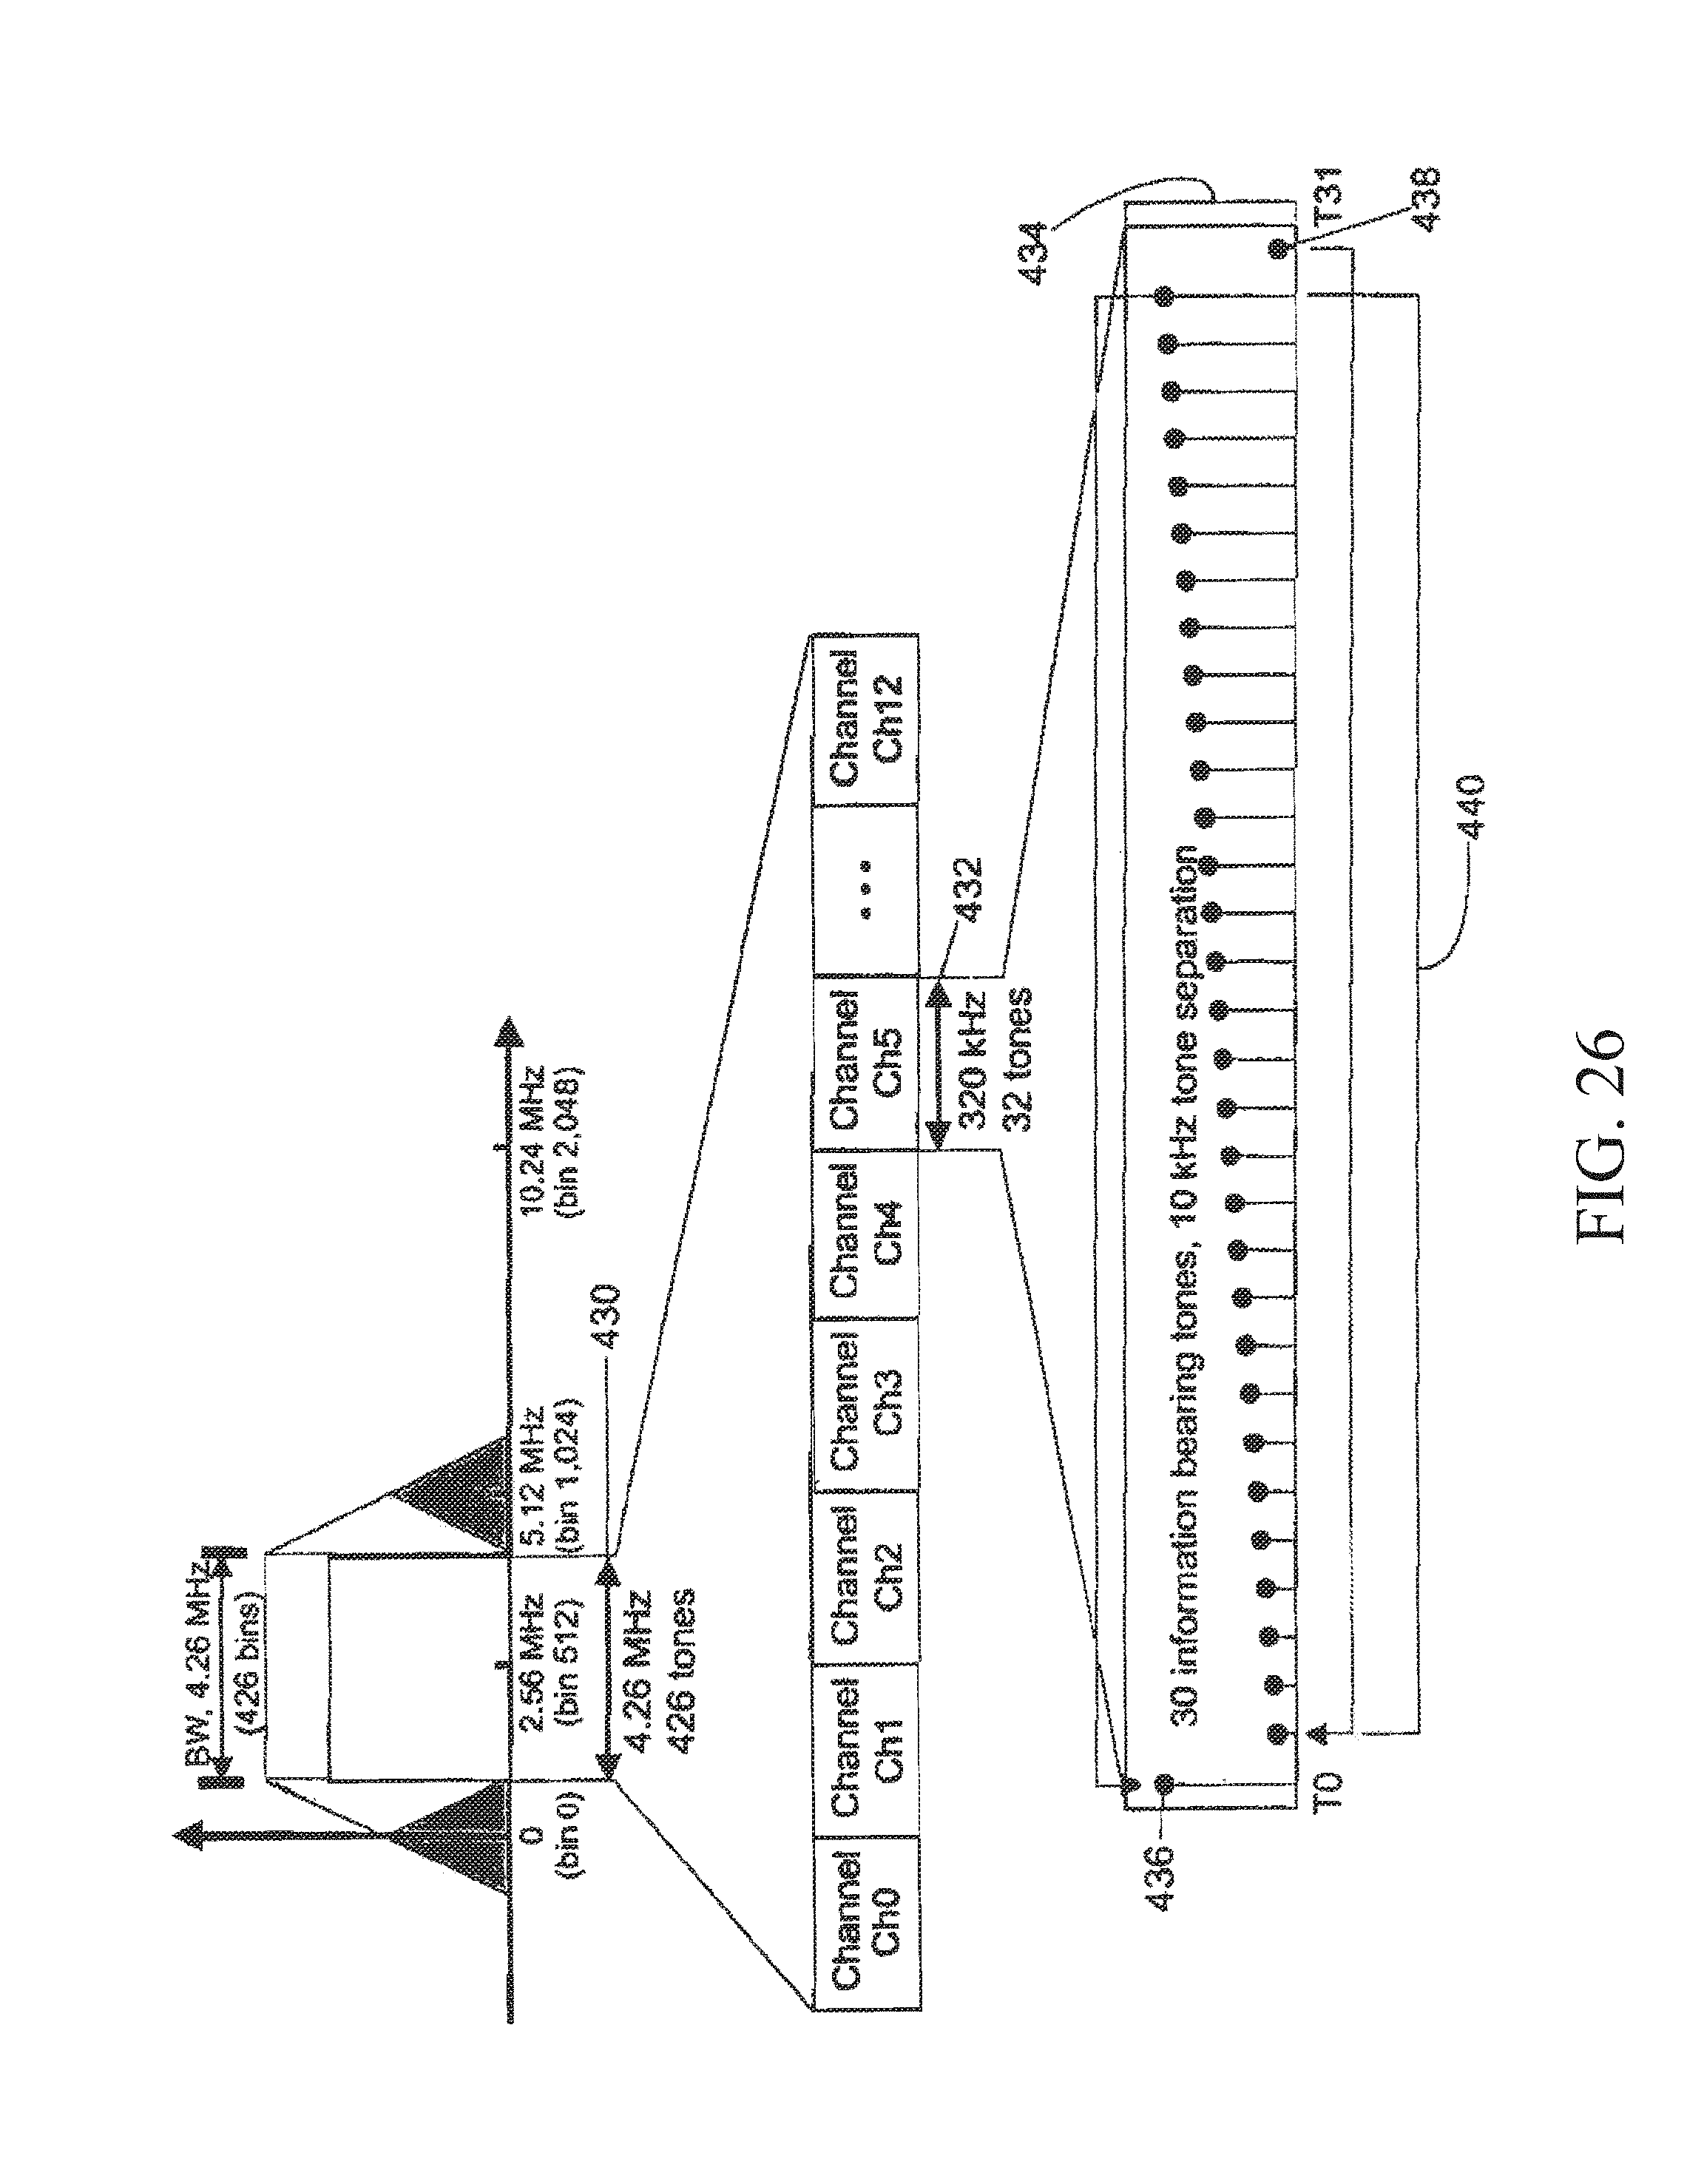 Mk Indy Electric Reverse Wiring Diagram